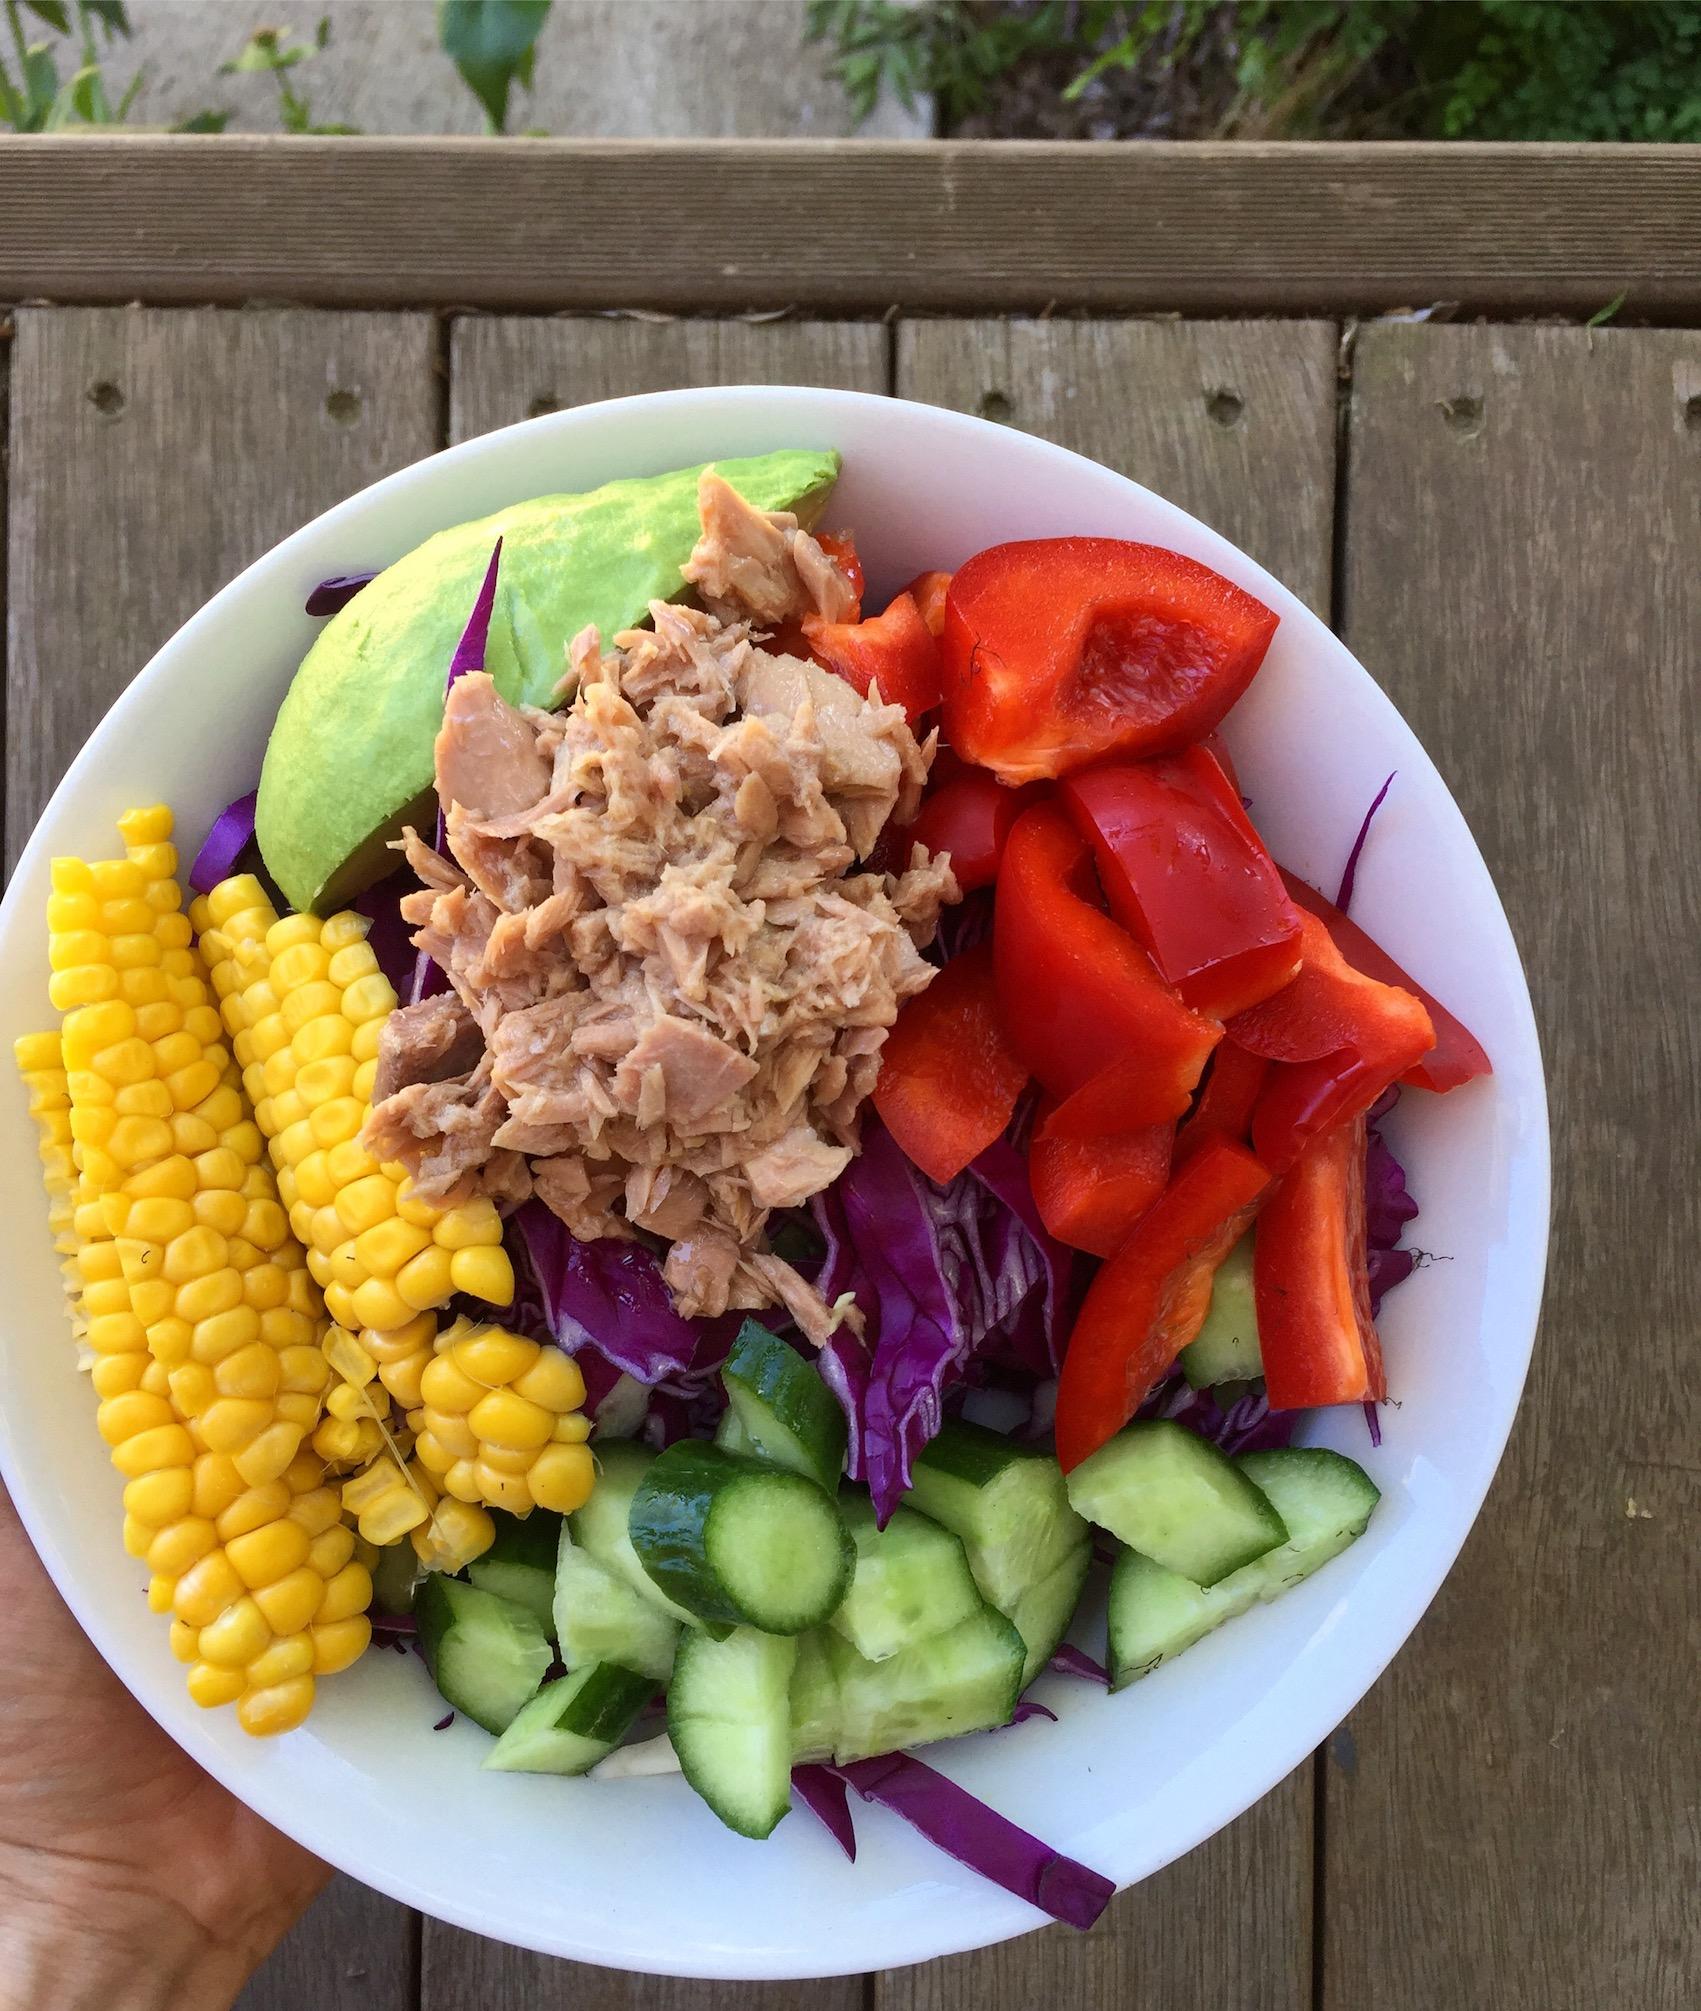 Salad with corn and tuna - easiest salad combo ever!